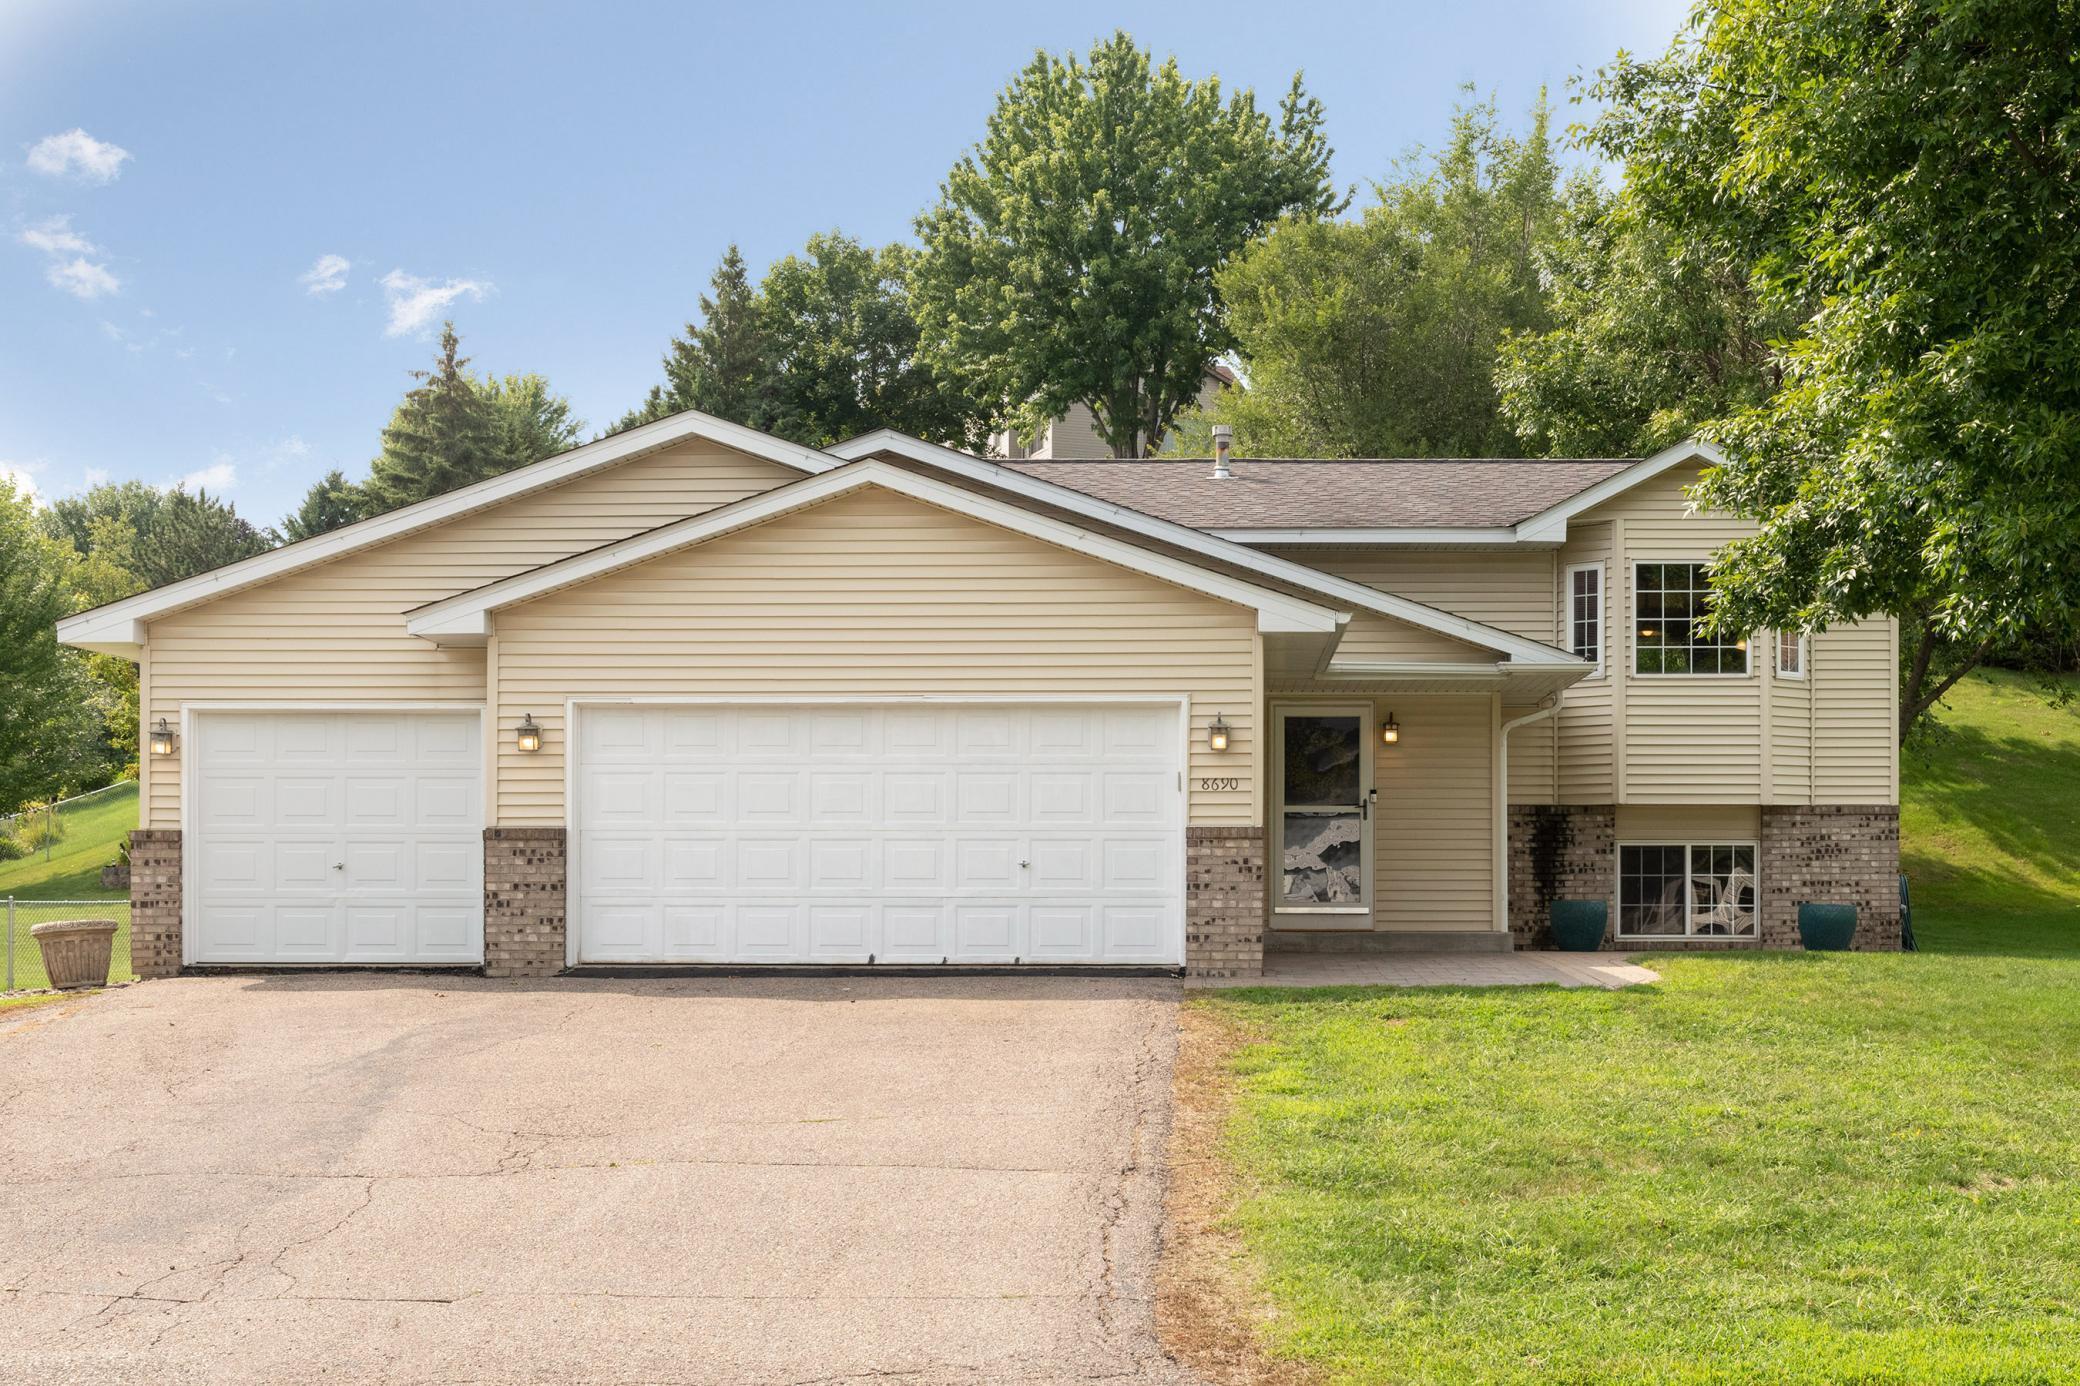 8690 Hillview Drive E Property Photo - Saint Bonifacius, MN real estate listing